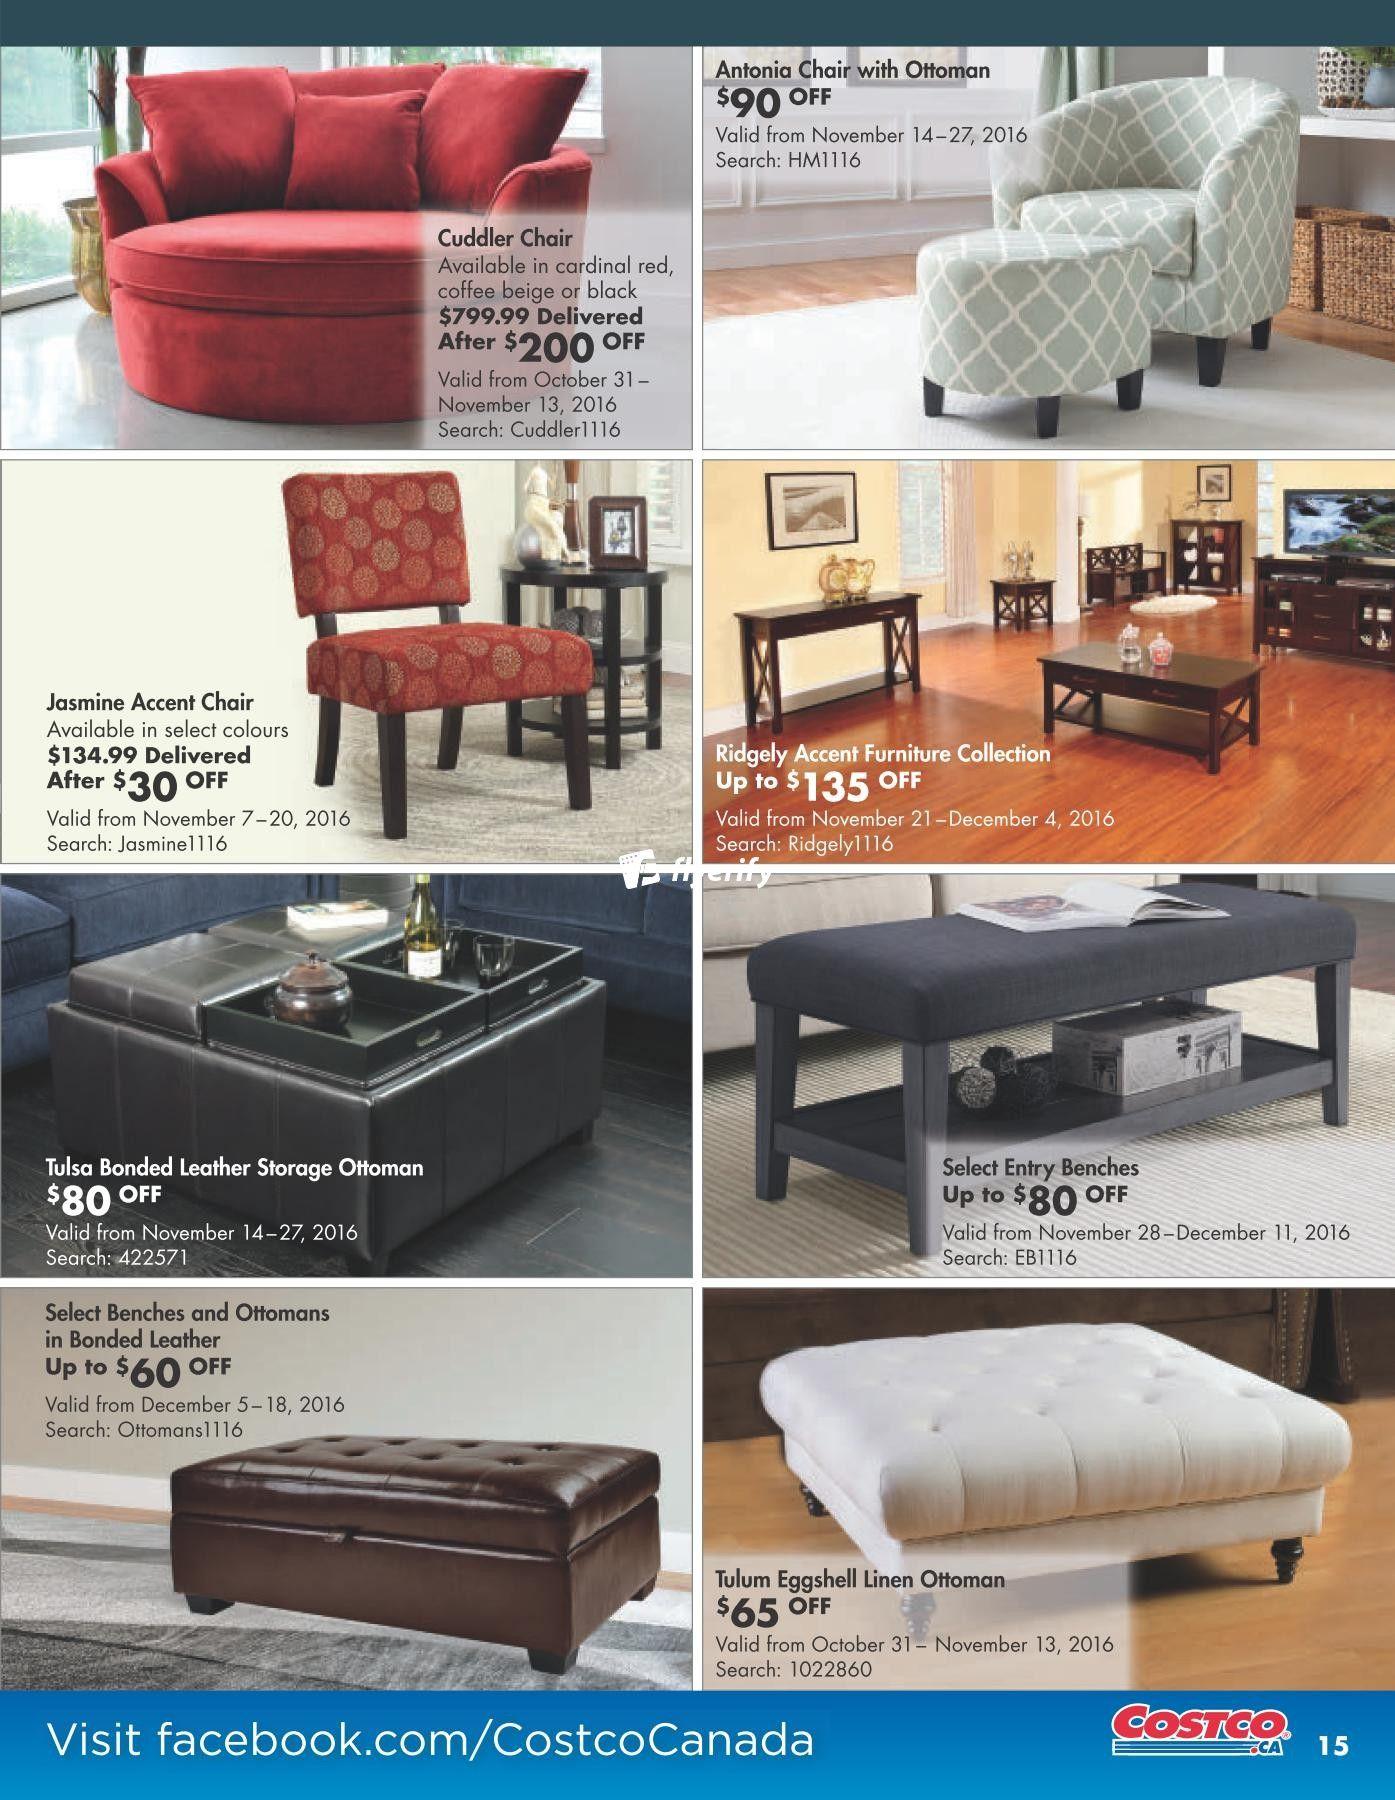 Costco Online Catalogue November 1 To December 31 Canada Furniture Costco Furniture Furniture Collection